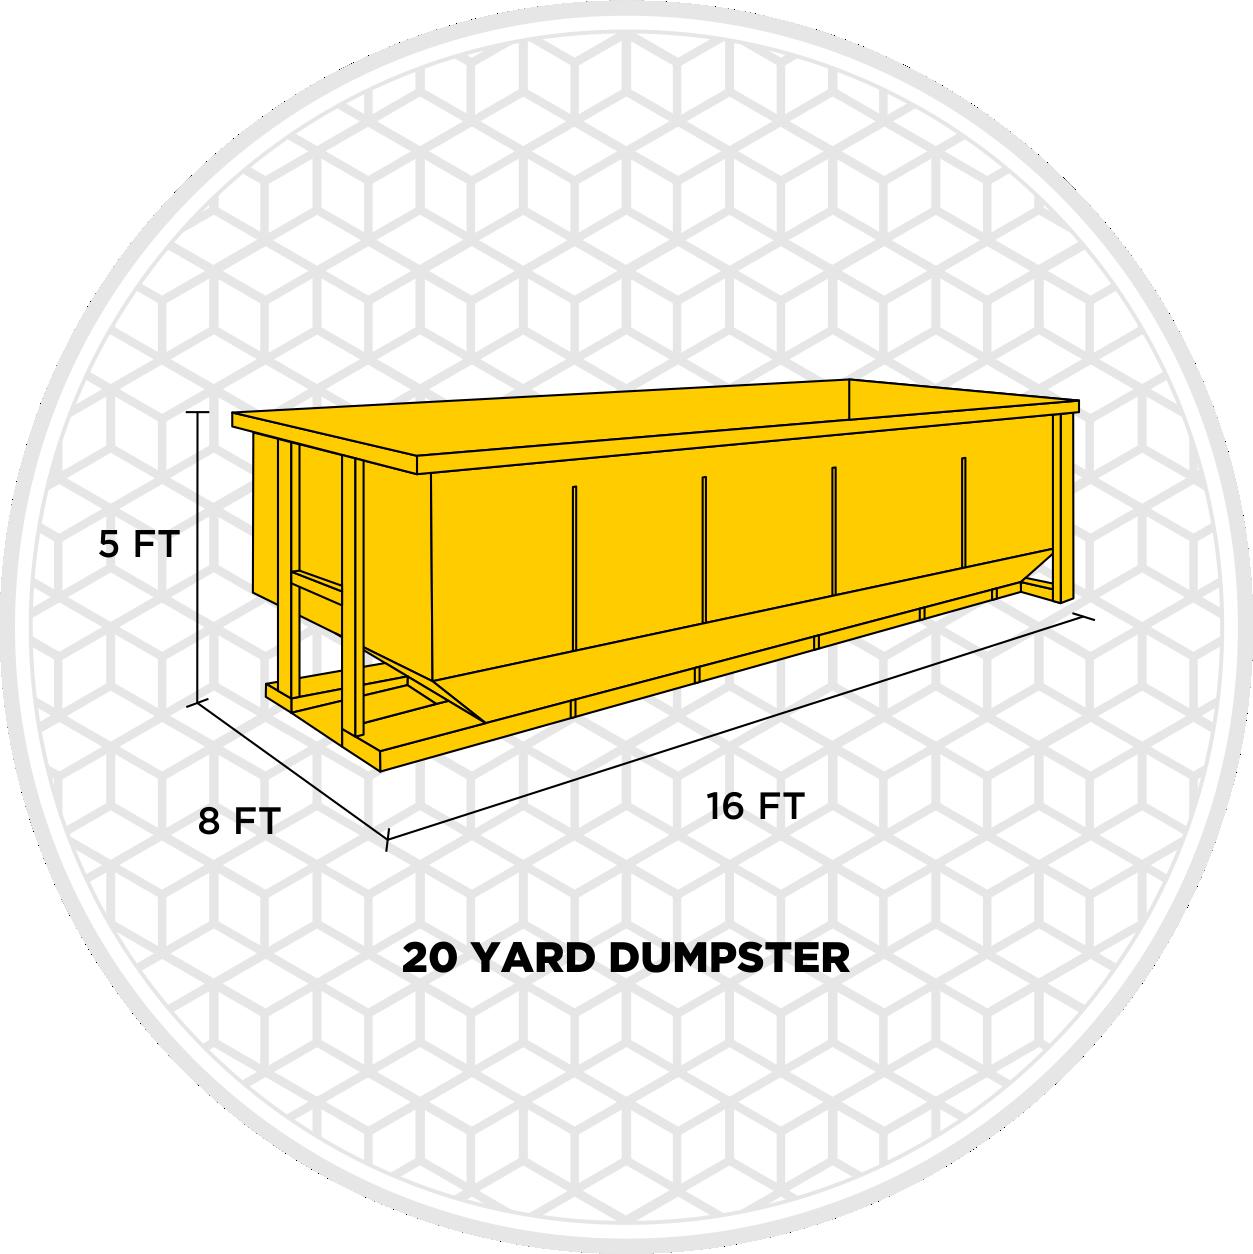 20 yard dumpster dimensions